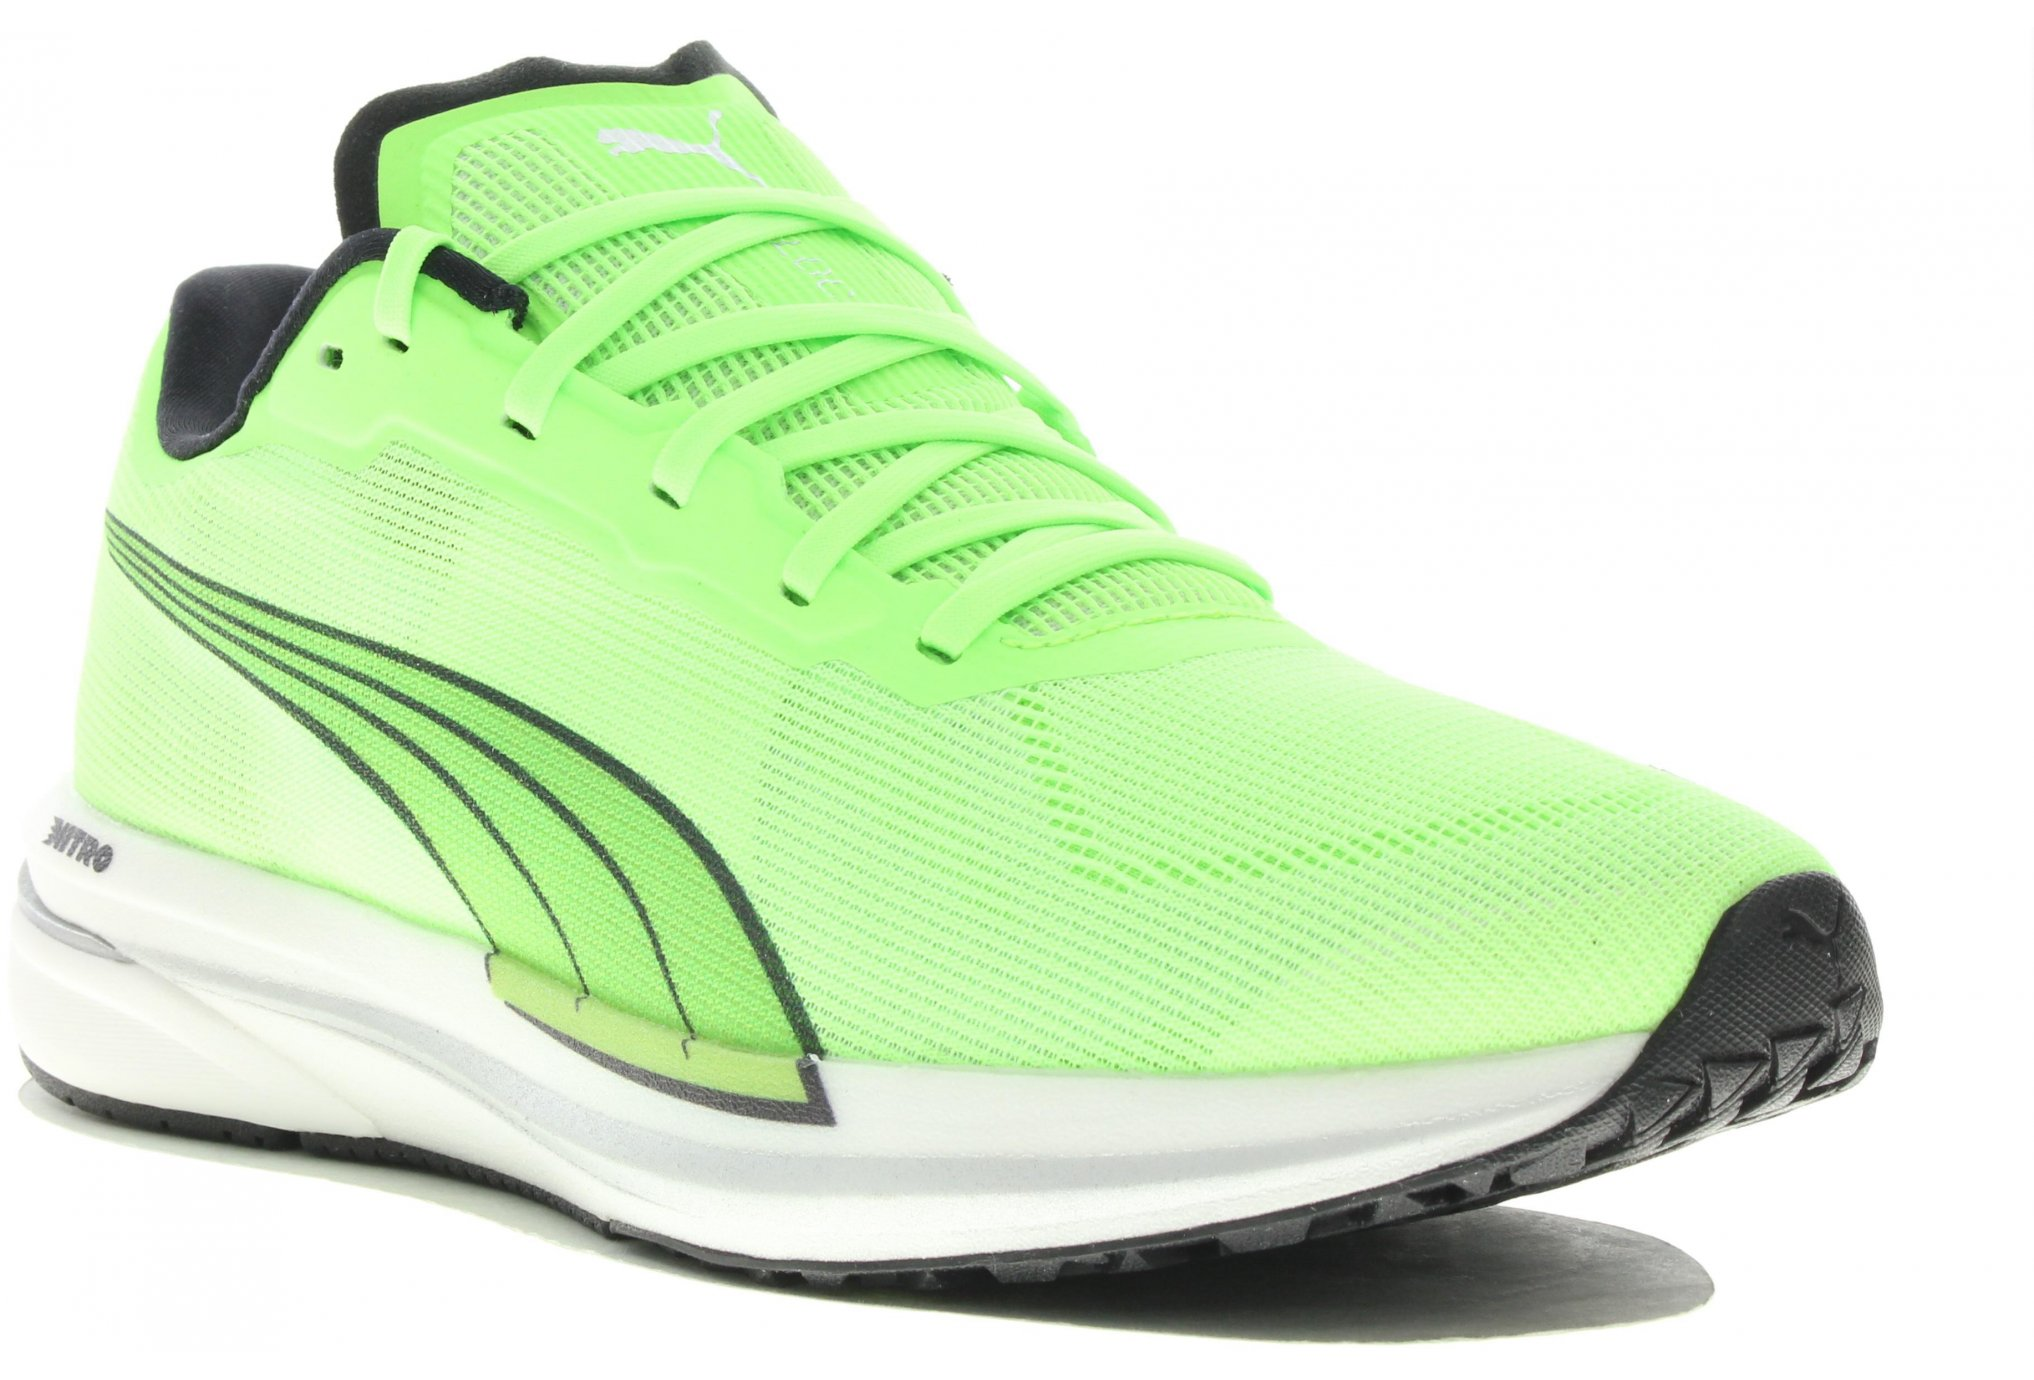 Puma Velocity Nitro M Chaussures homme